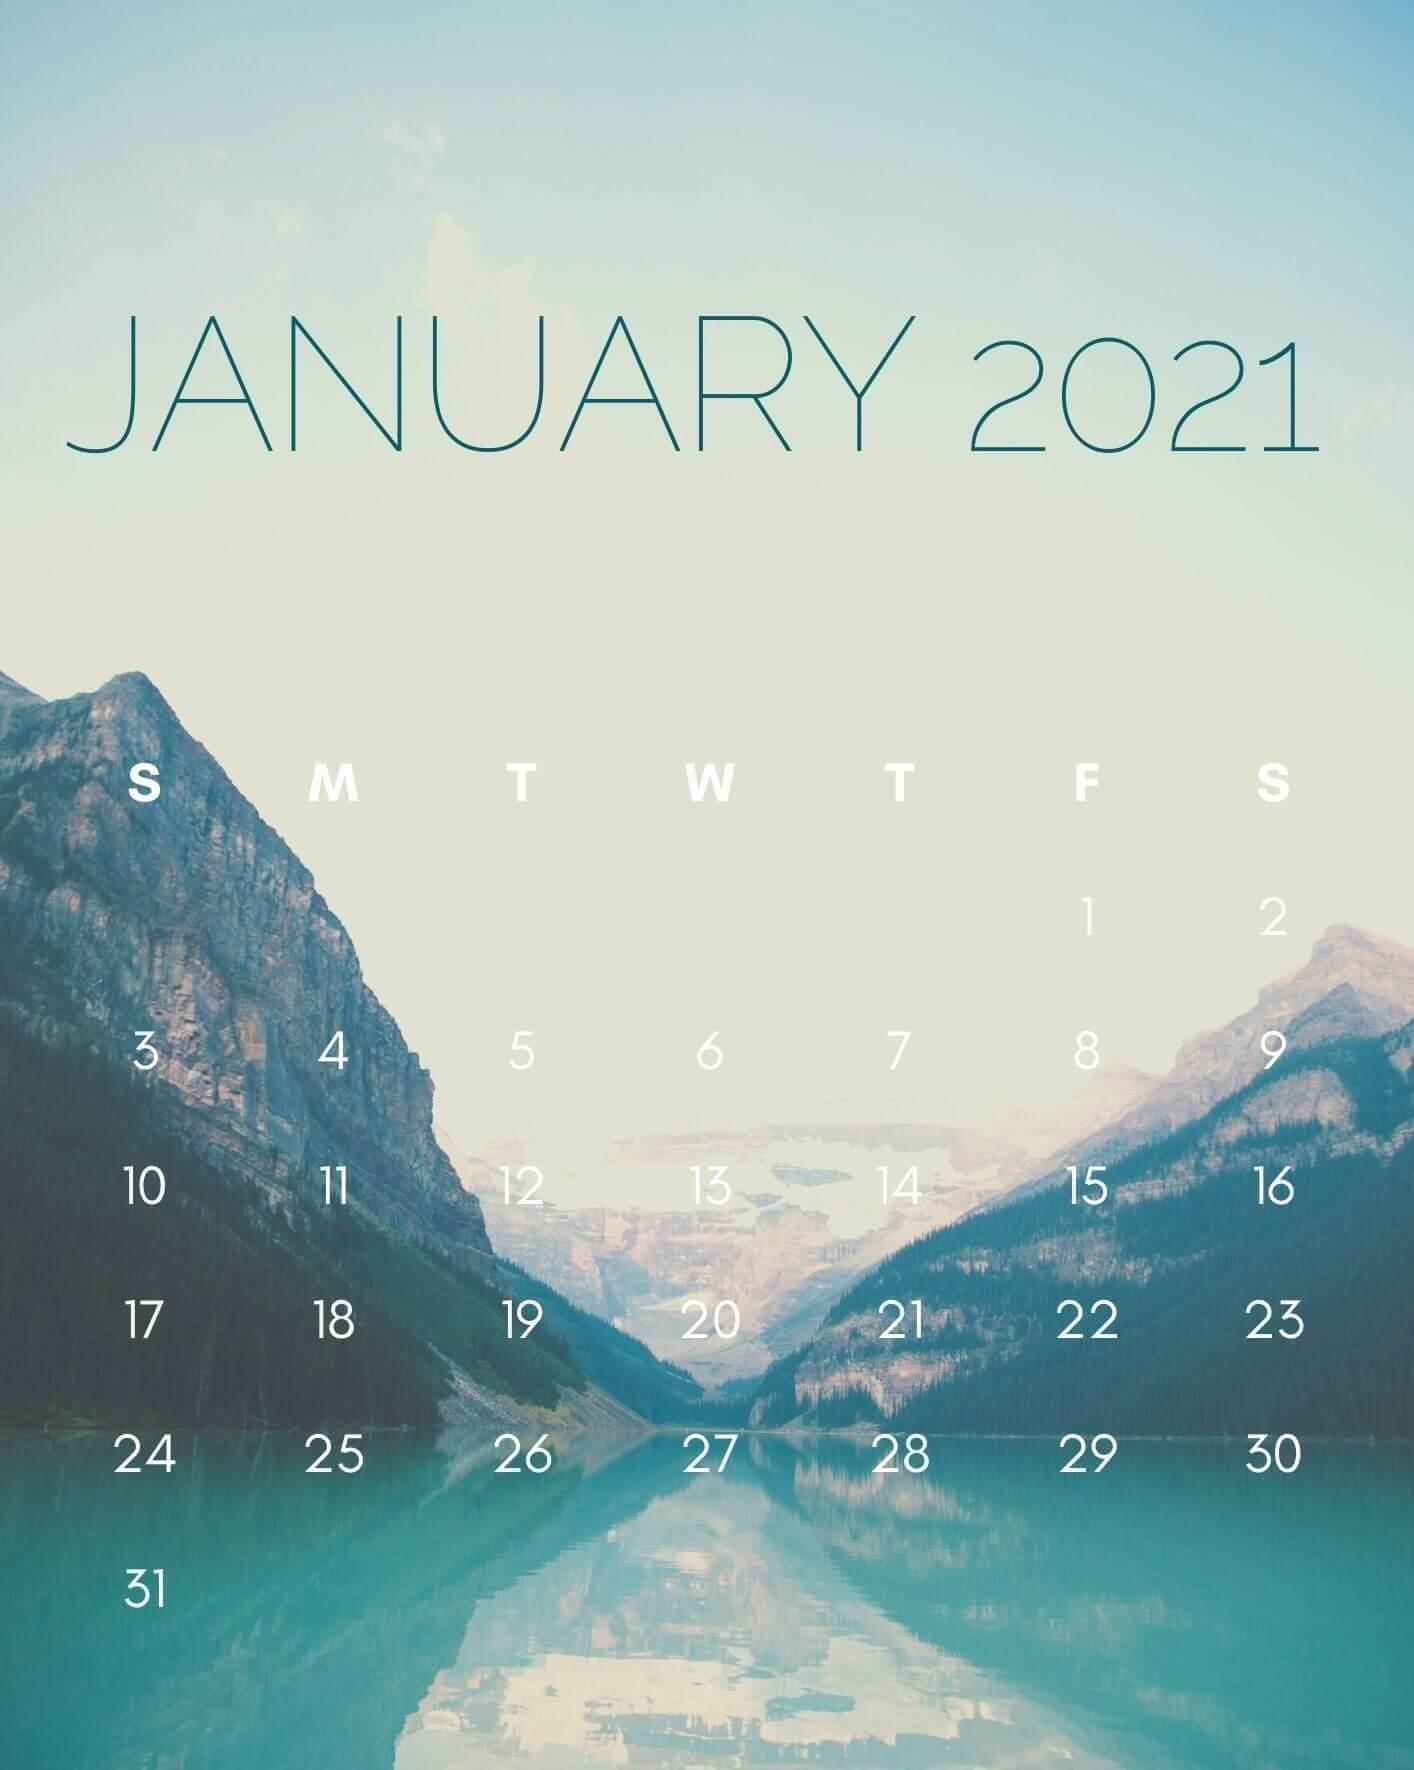 January 2021 iPhone Calendar